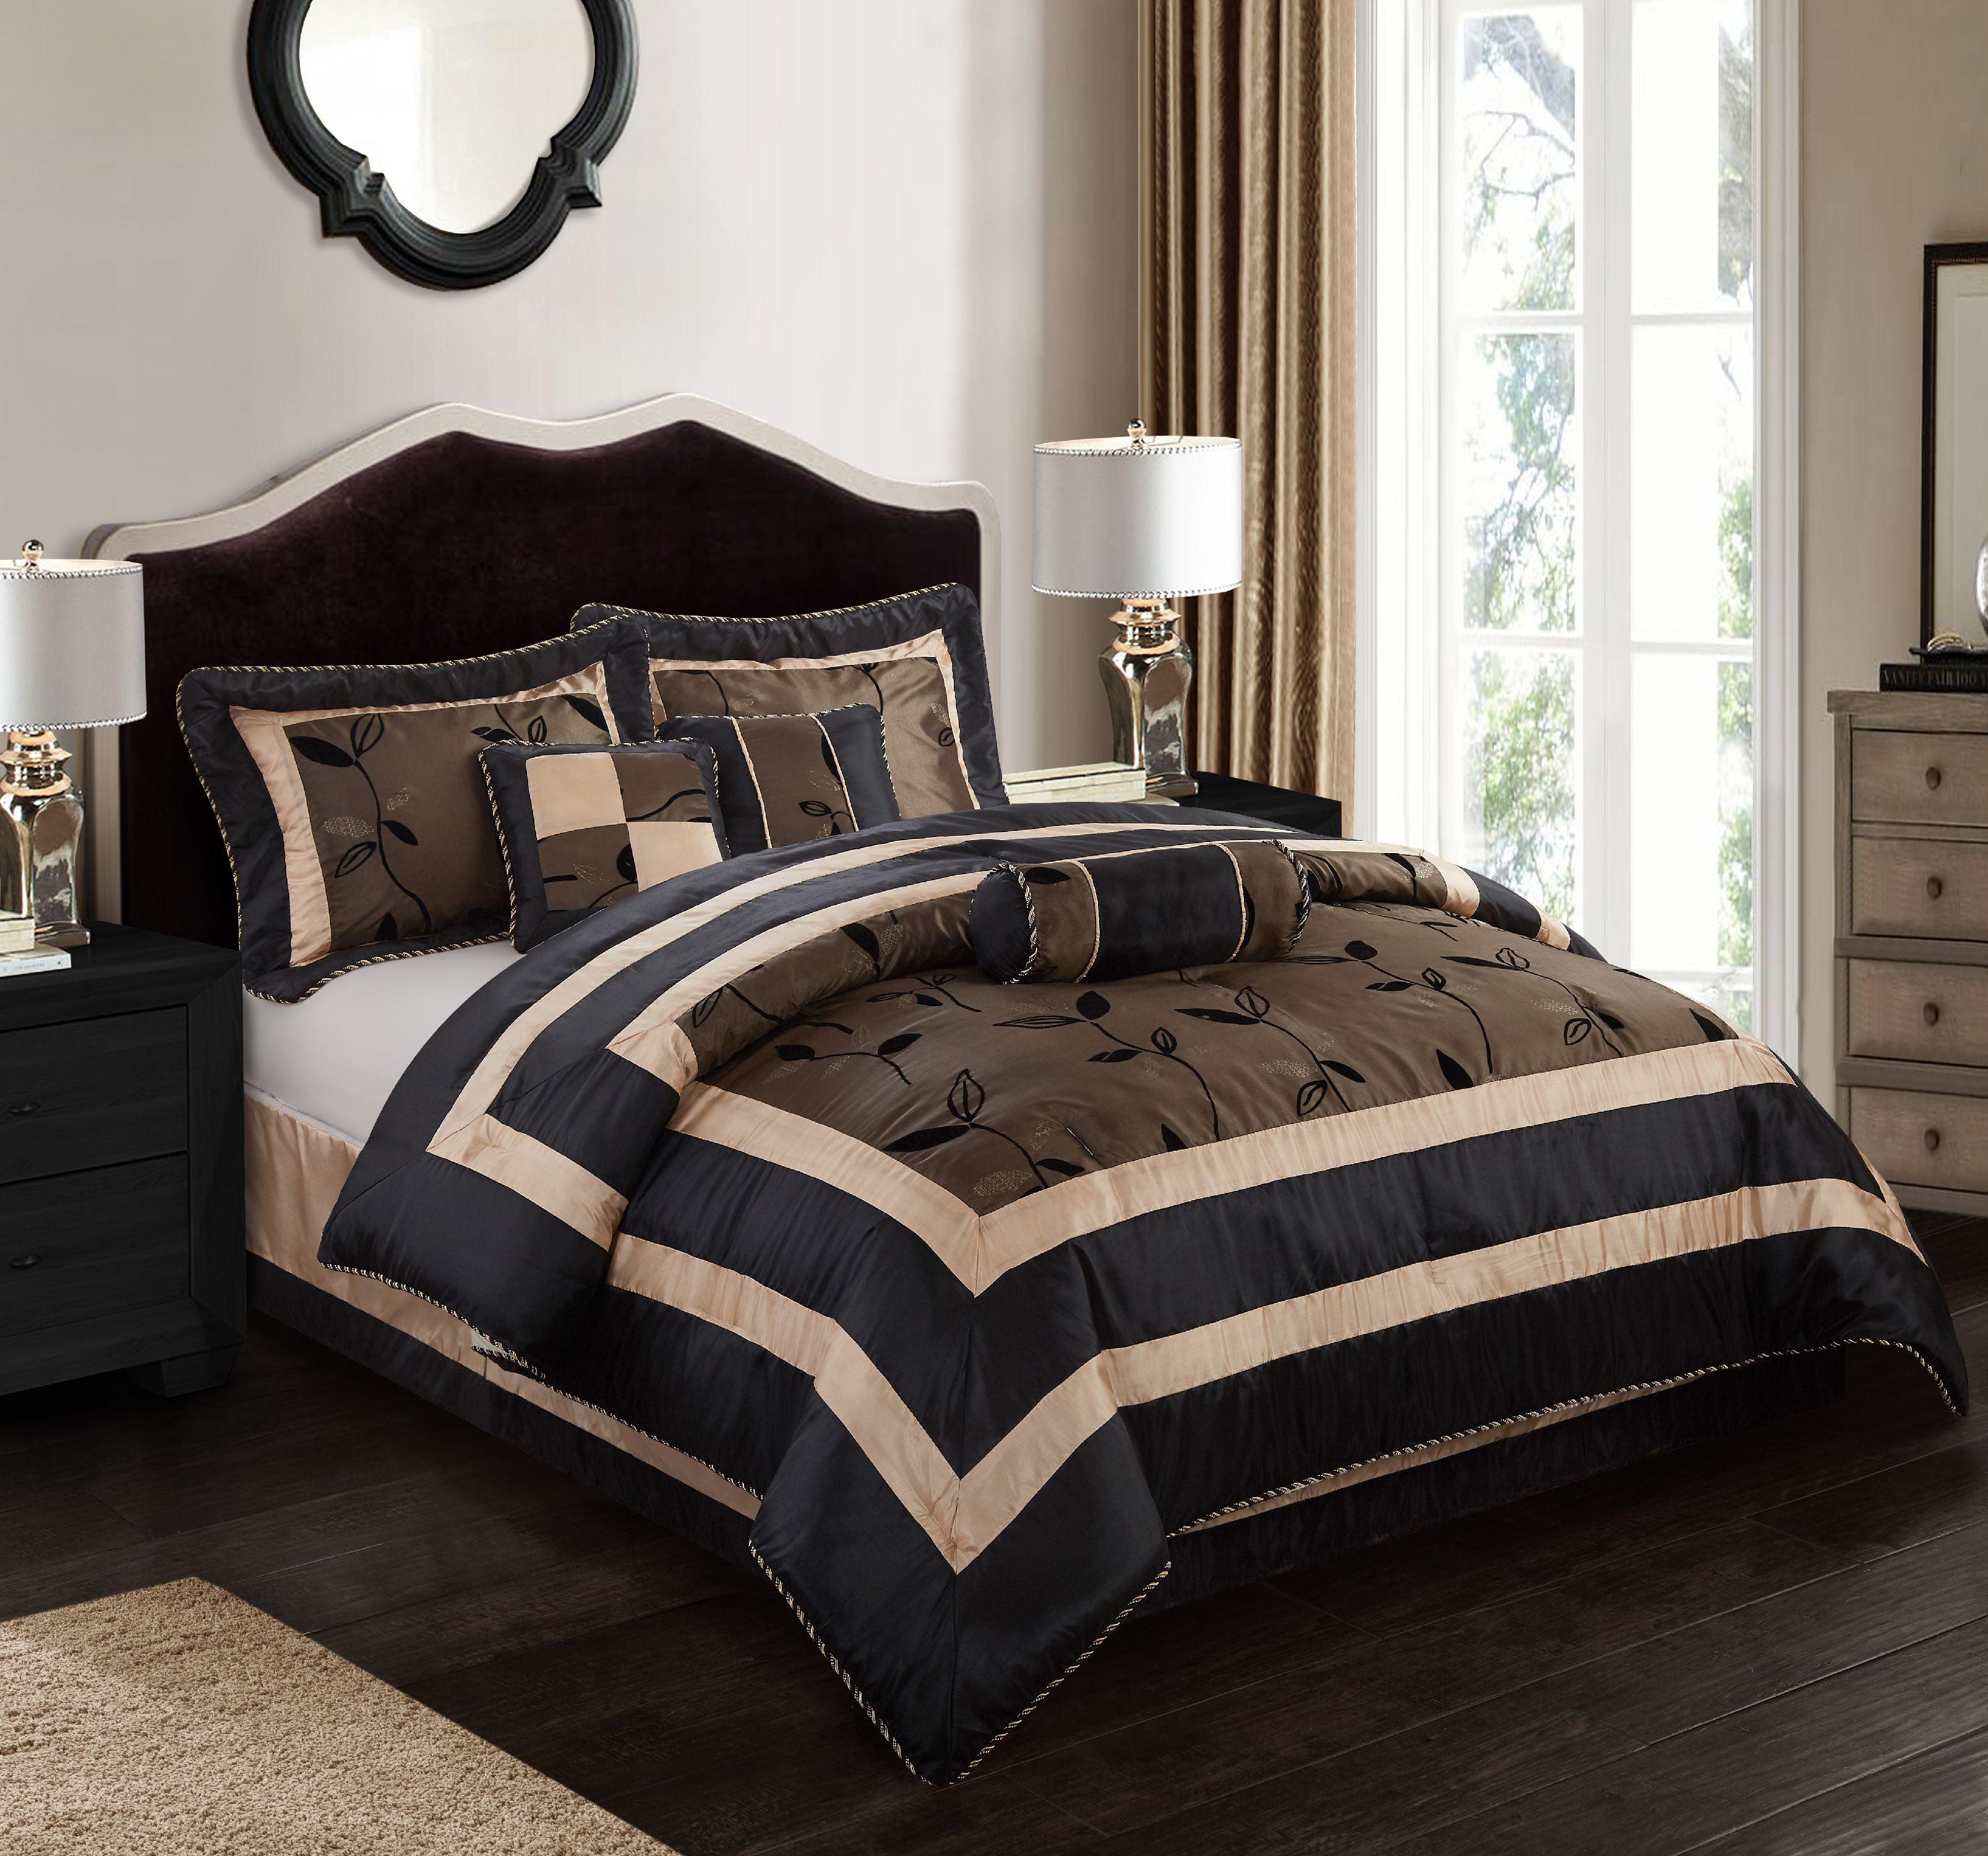 Nanshing Pastora Luxury 7-Piece Bedding Comforter Set with 3 BONUS Decorative Pillows, Full, Brown - Walmart.com